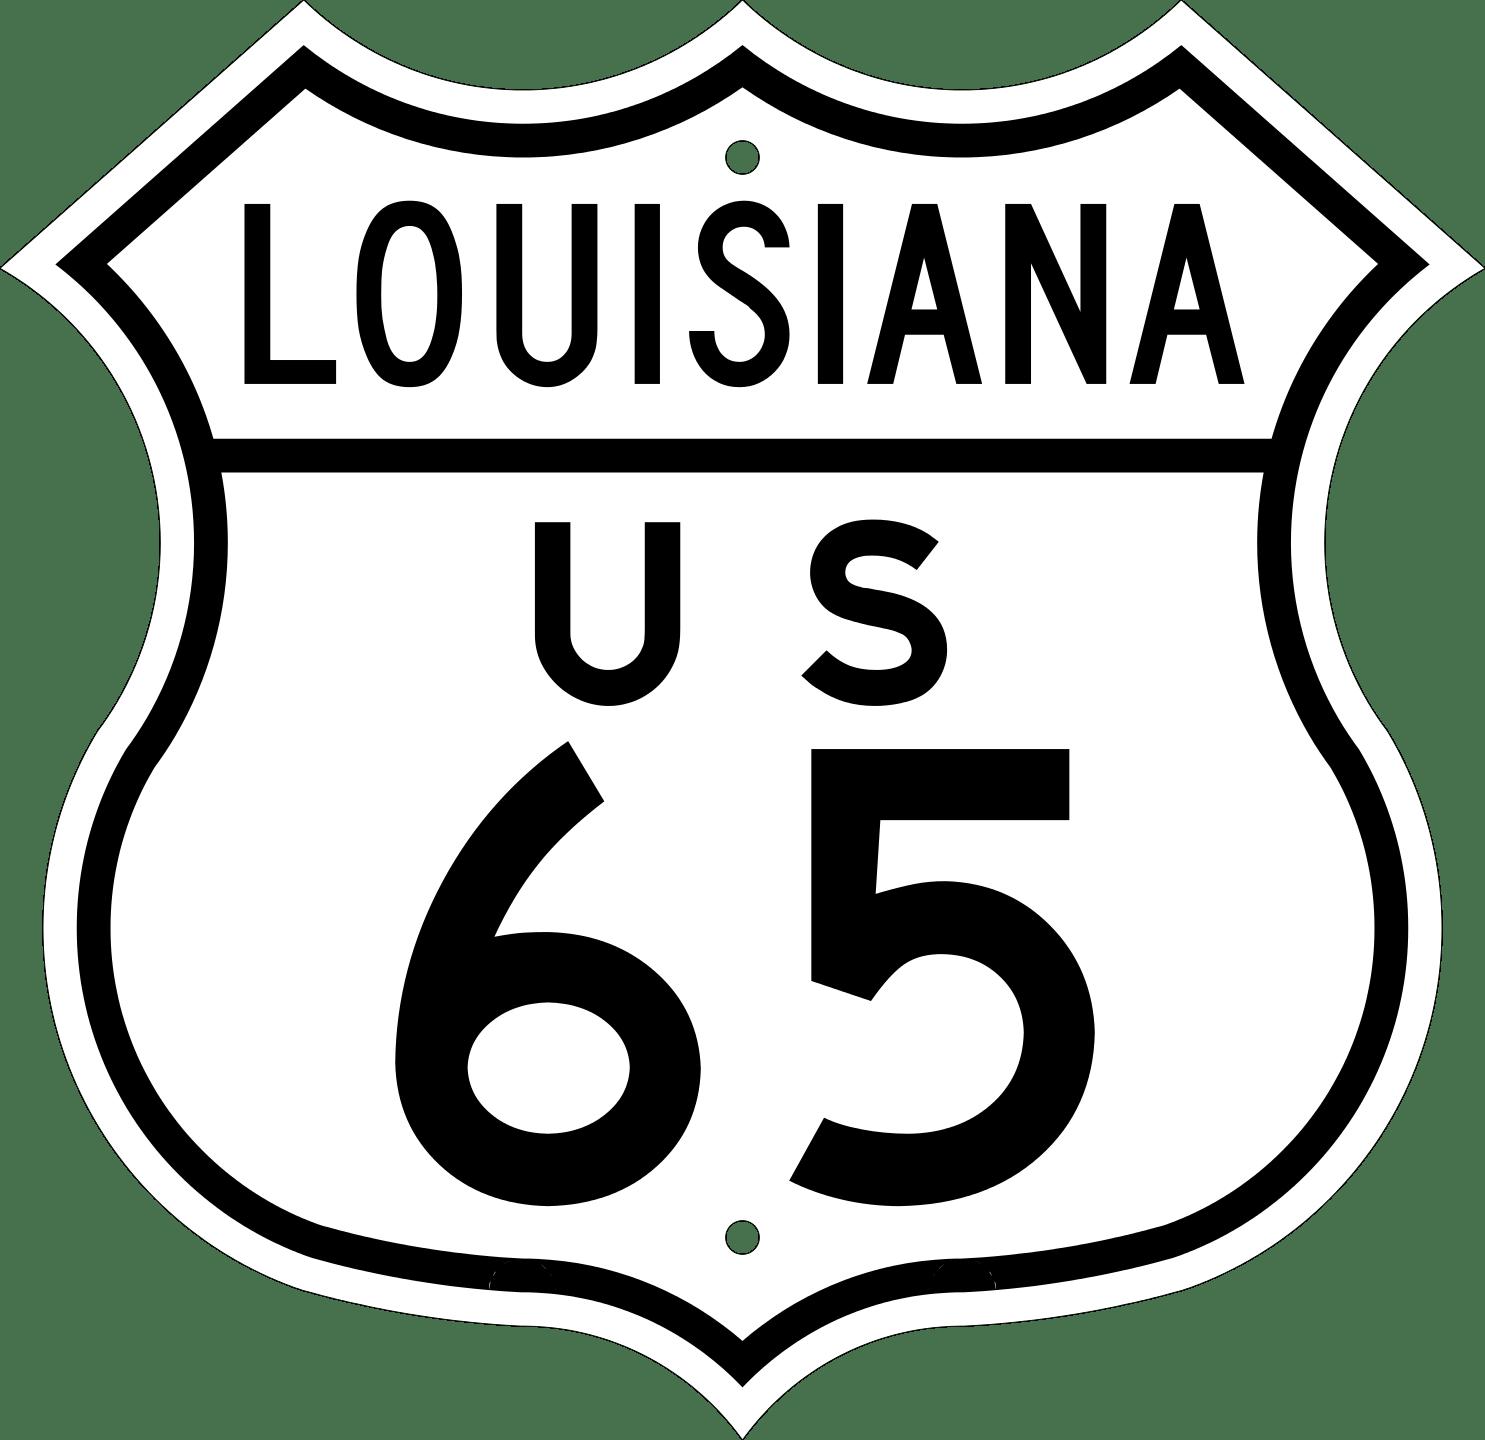 Louisiana Clipart Svg Louisiana Svg Transparent Free For